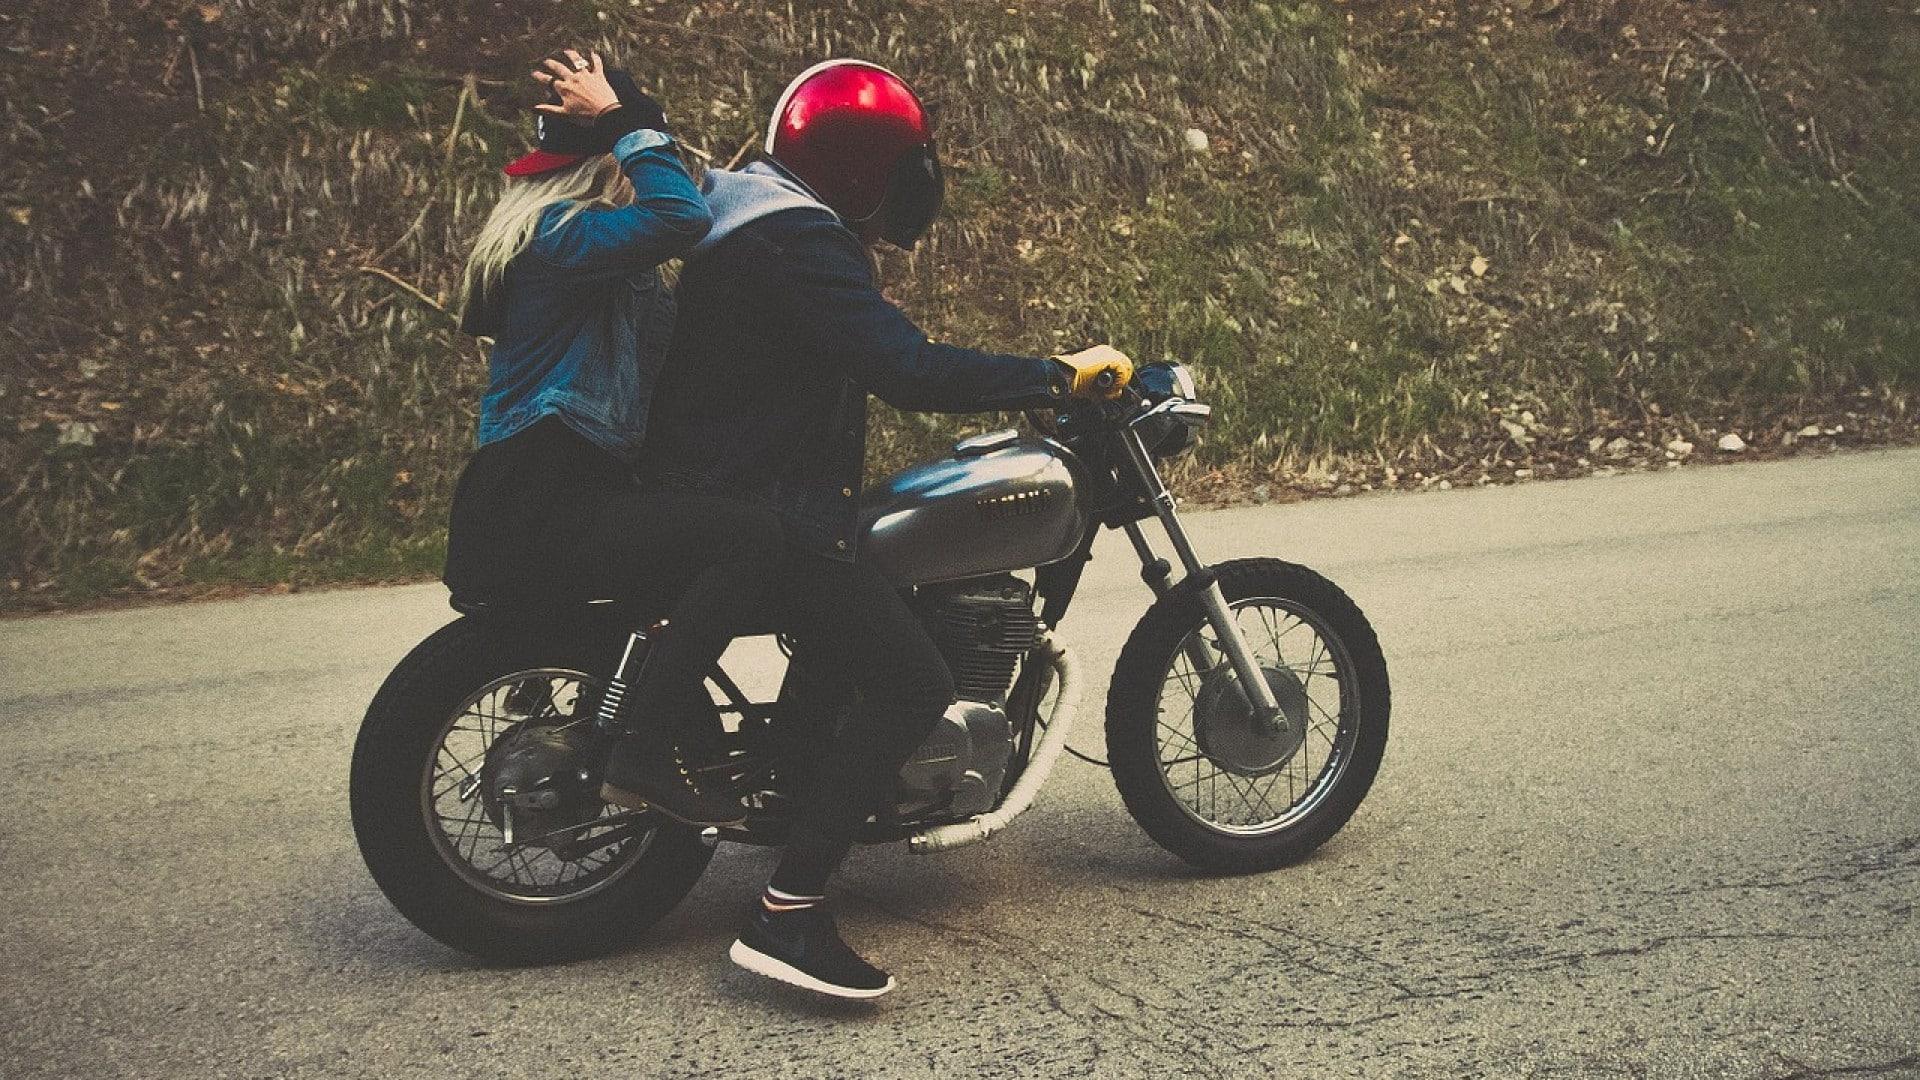 Casque de moto : pourquoi en porter ?